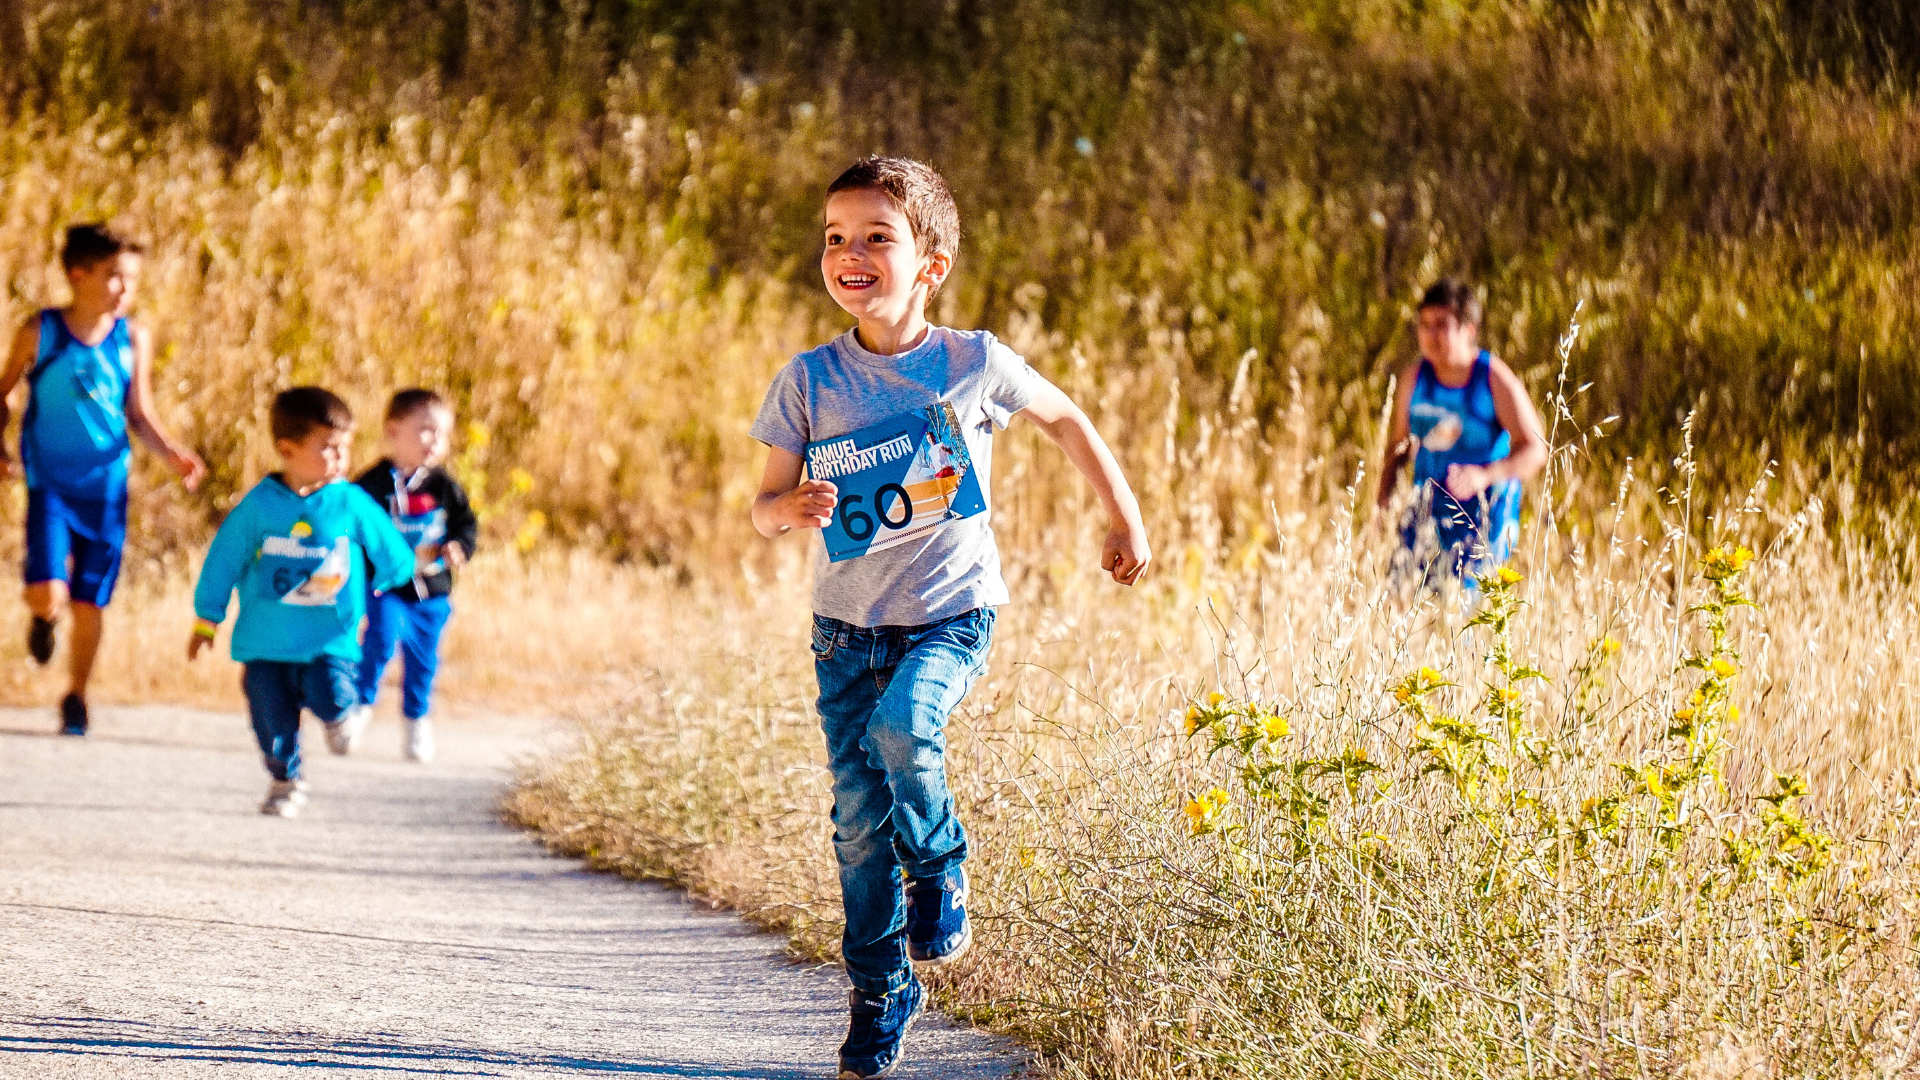 boy-running-on-pathway